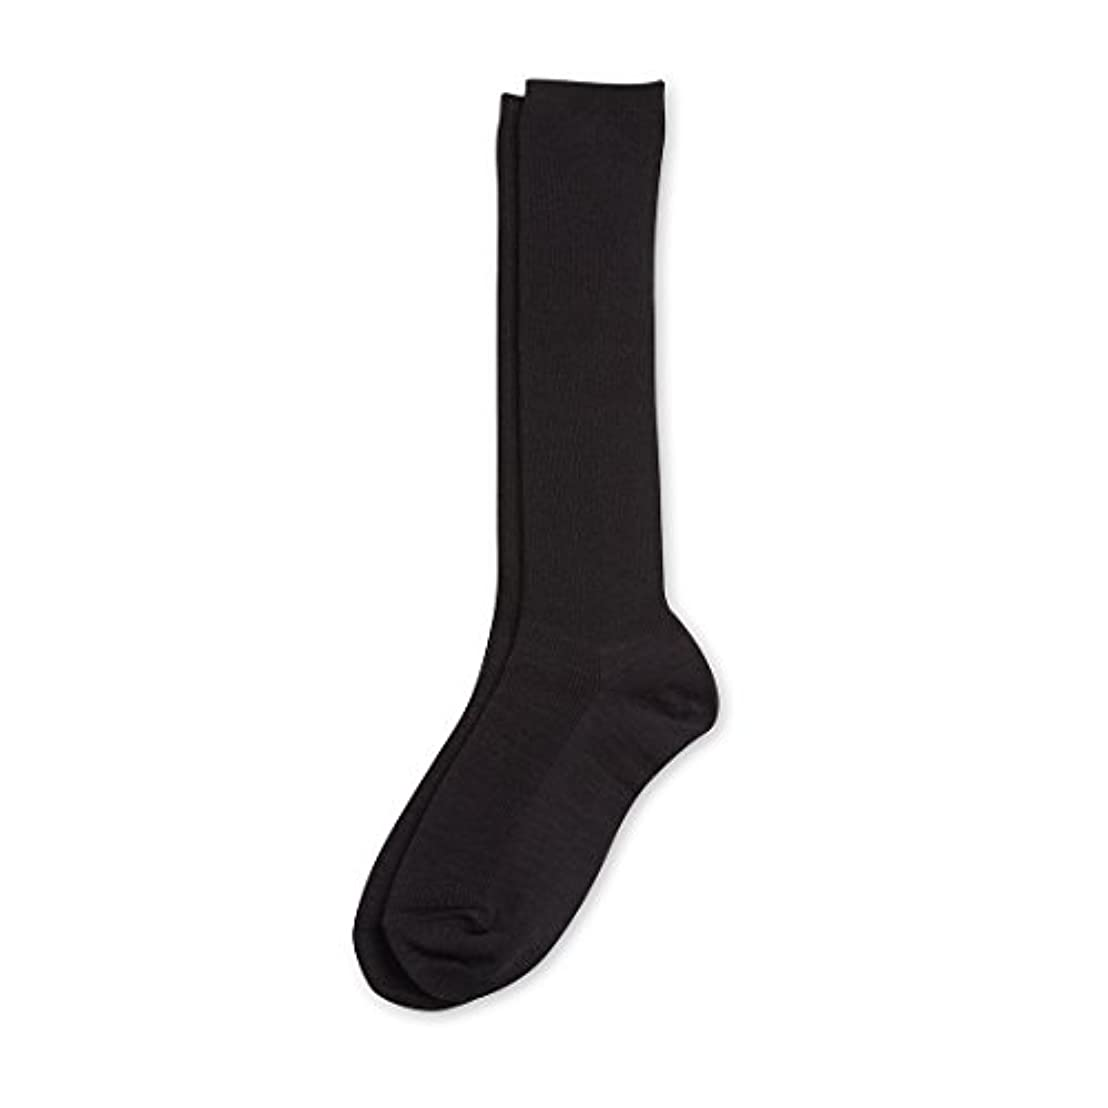 Deol(デオル) ハイソックス 女性用 日本製 靴下 黒 23cm-25cm